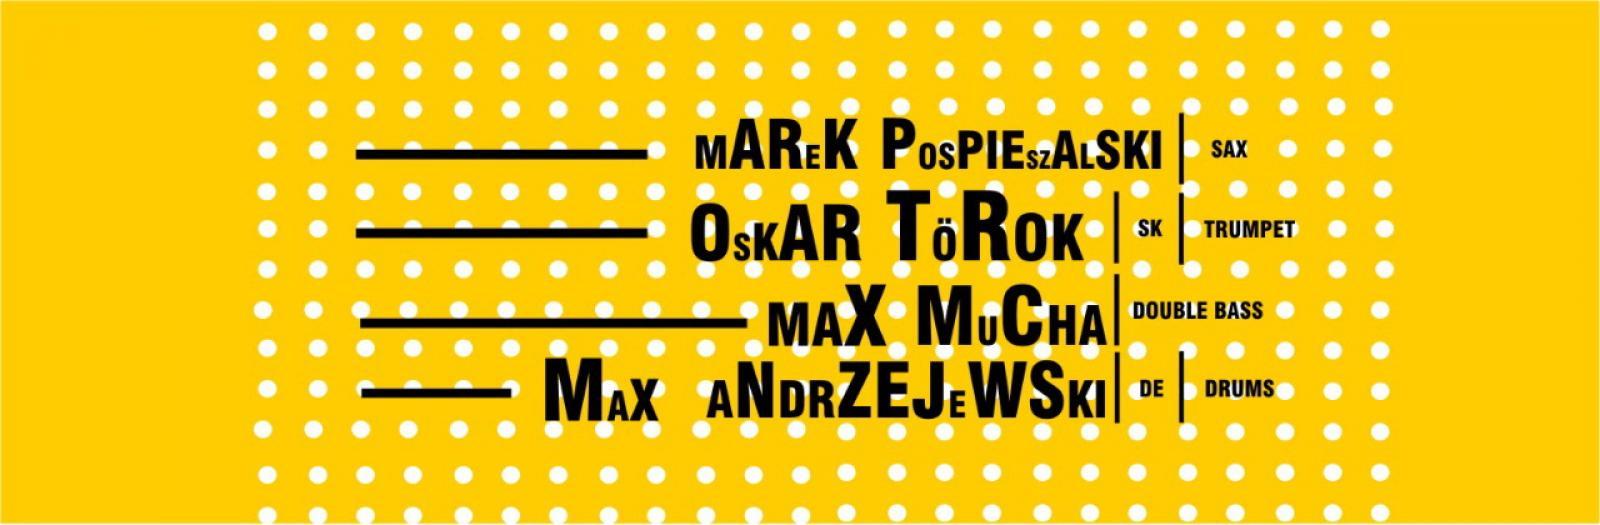 Pospieszalski/Török/Mucha/Andrzejewski (PL/SK/DE)